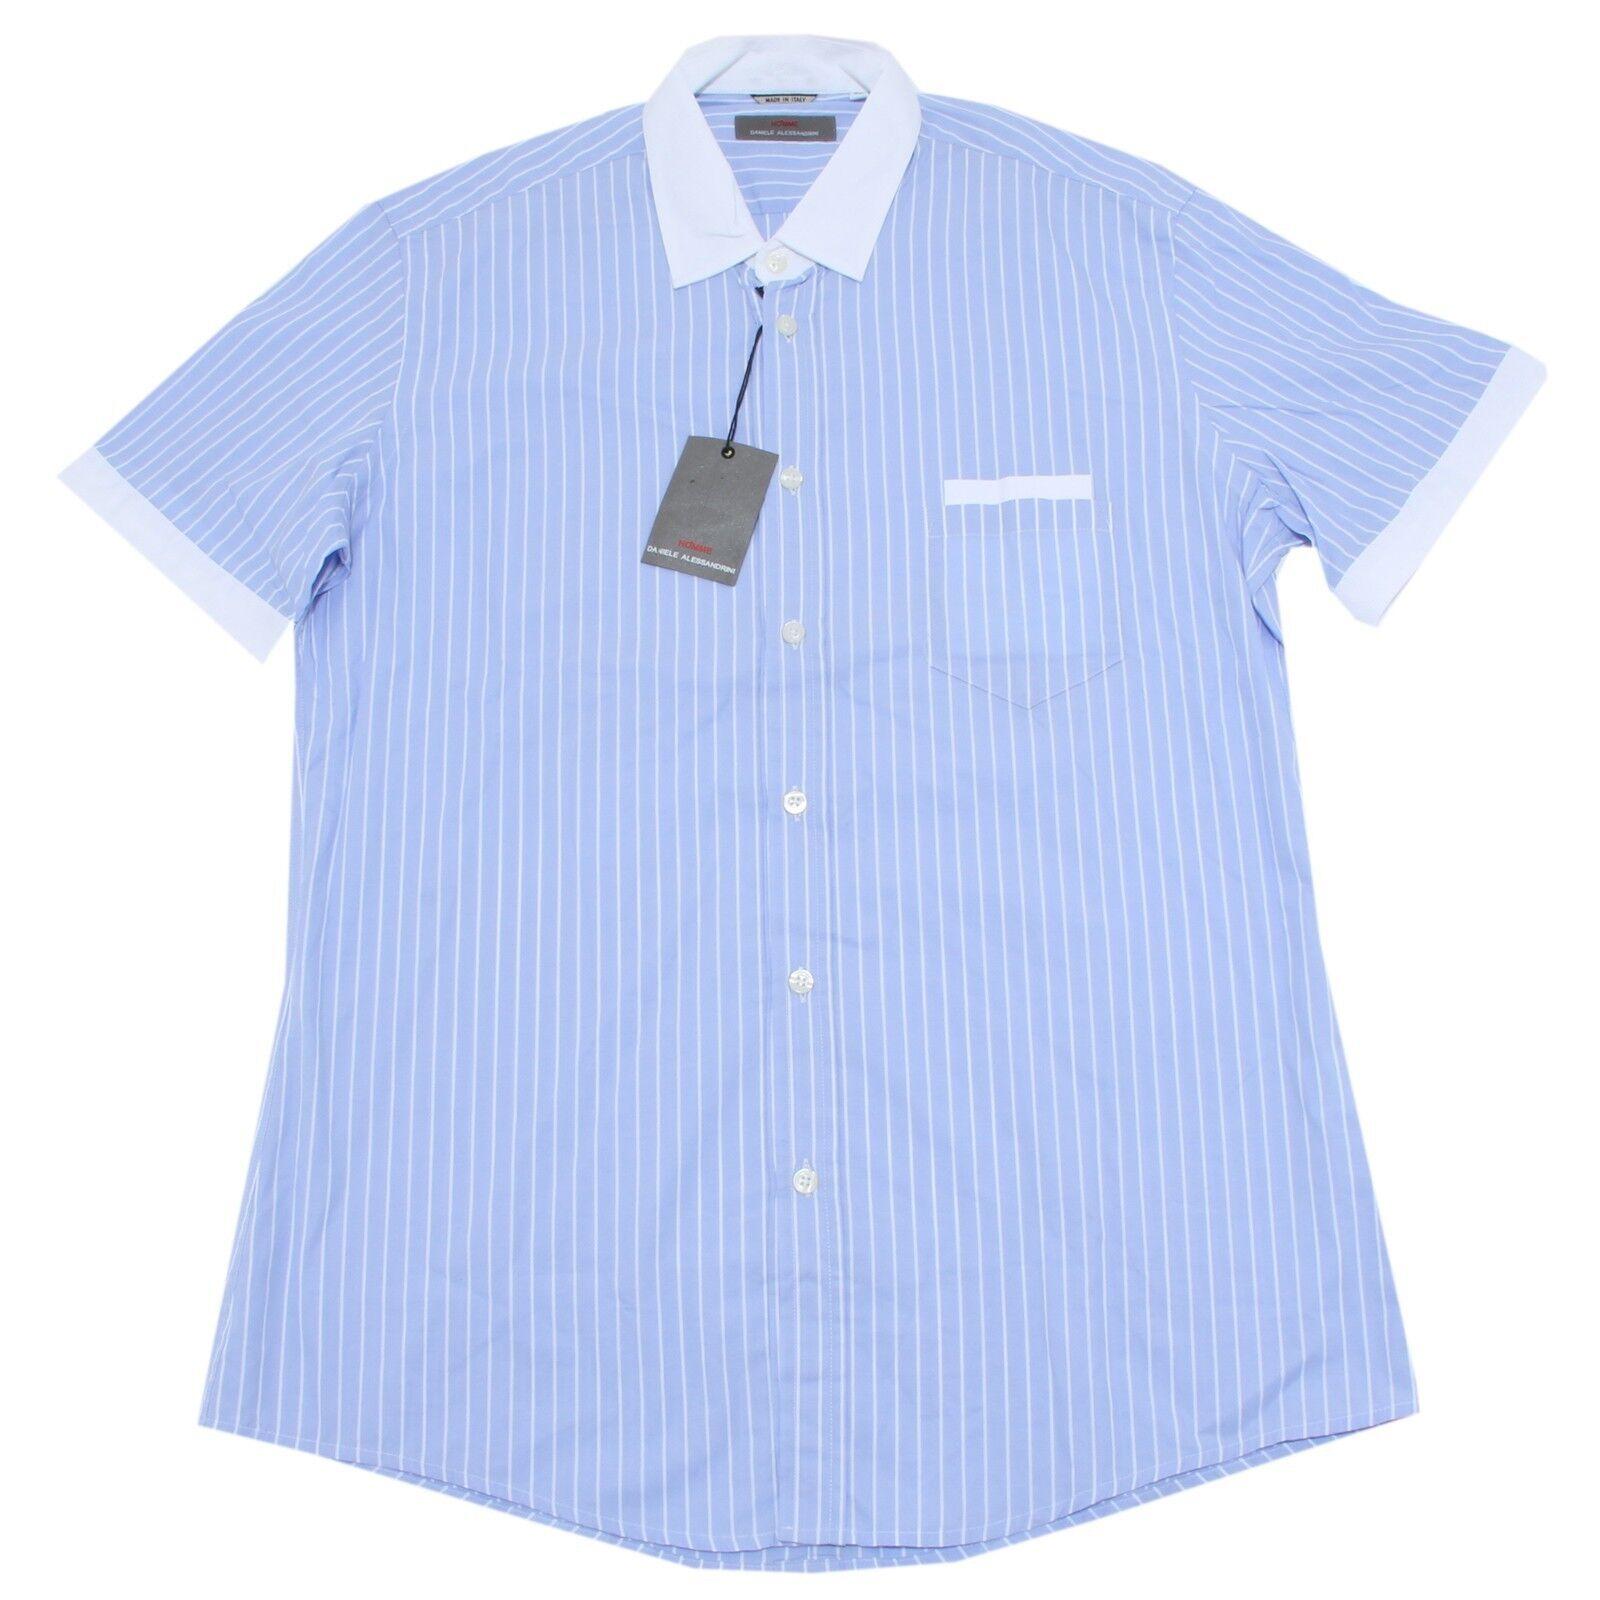 8124 camicia short sleeve DANIELE ALESSANDRINI  uomo shirt men